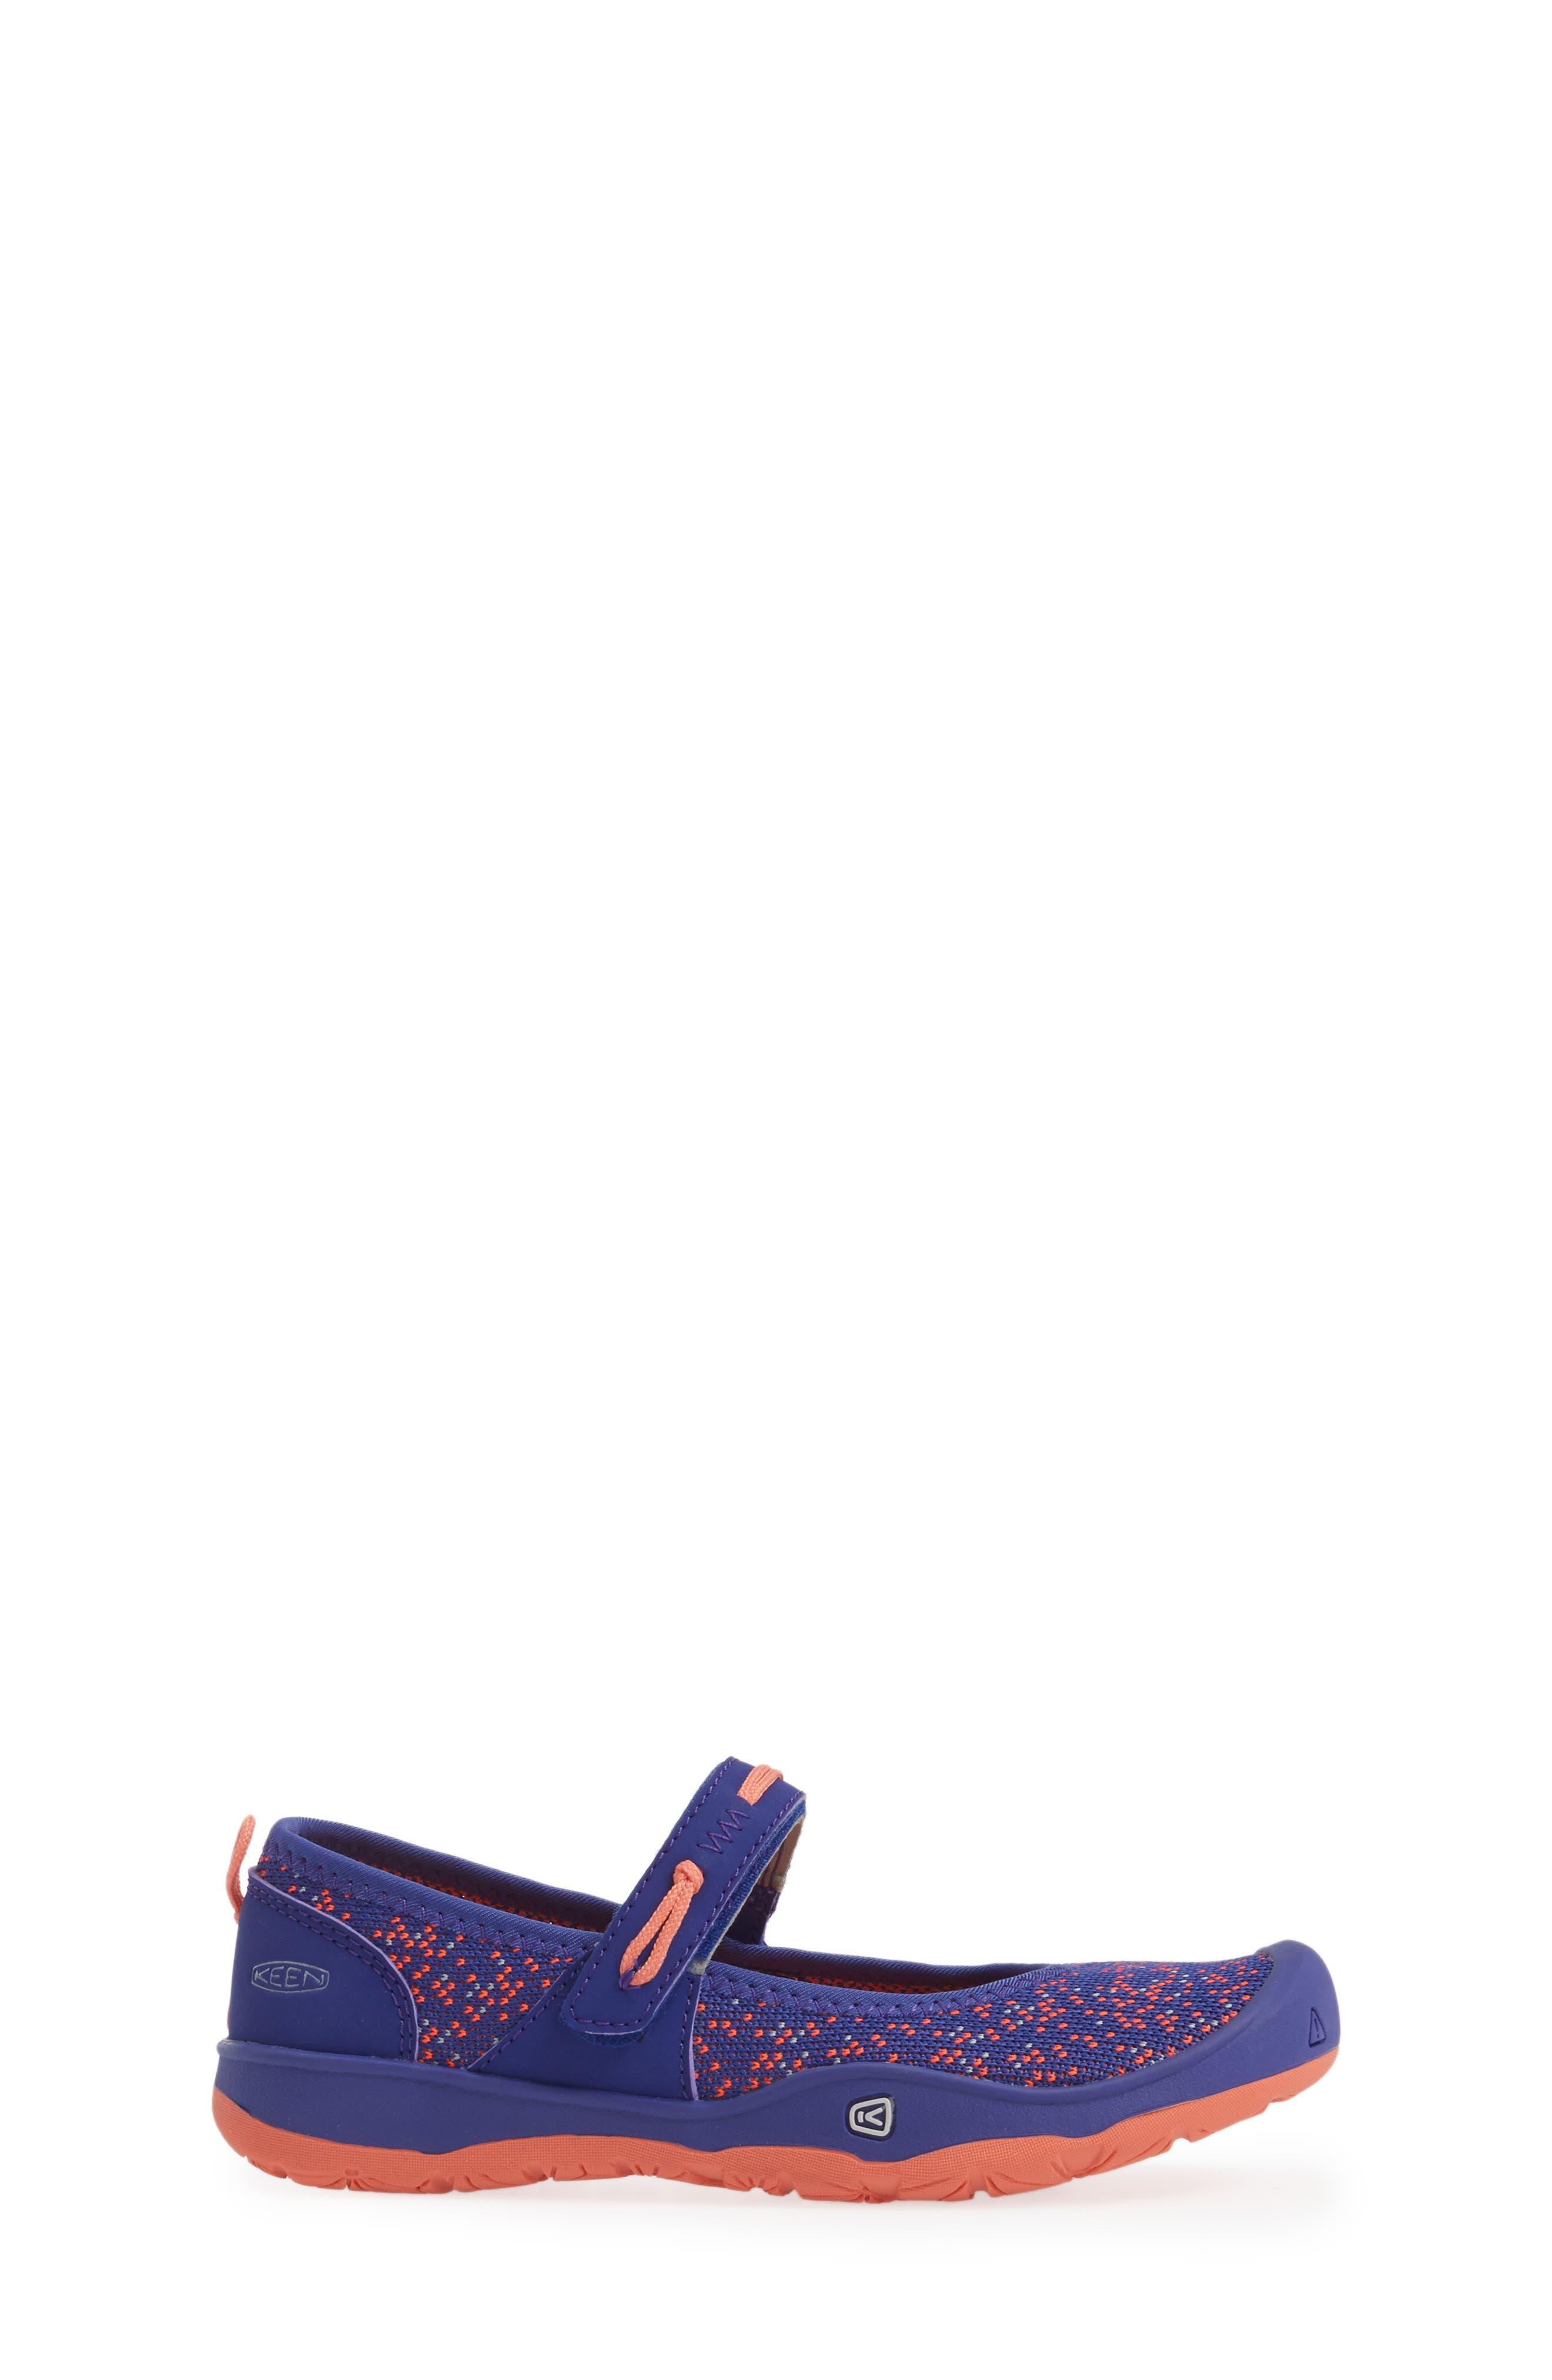 Moxie Mary Jane,                             Alternate thumbnail 3, color,                             Purple/ Fusion Coral